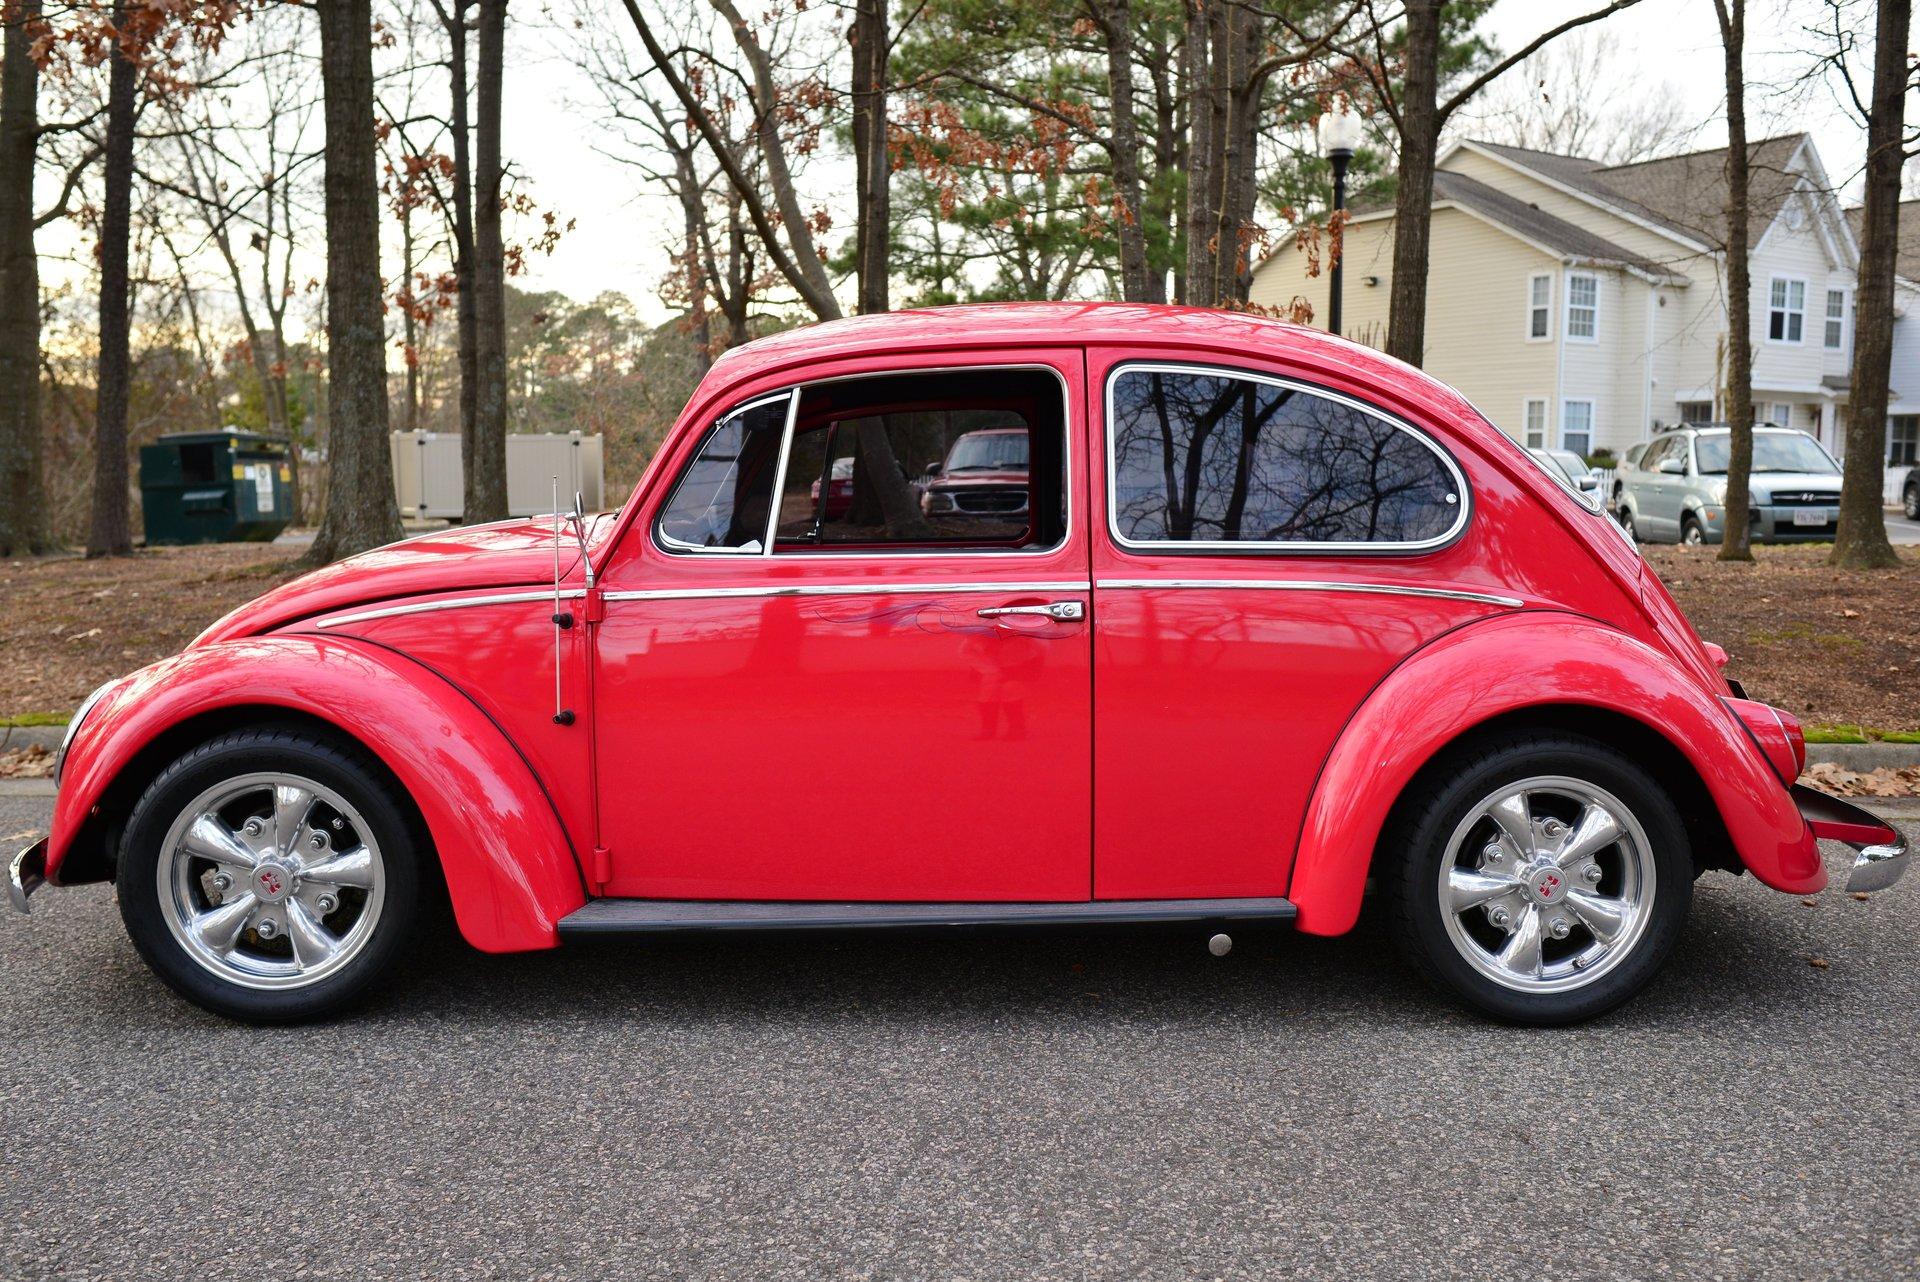 in vw volkswagen motors rockaway sale nj beetle trend for stk pink new at convertible watch